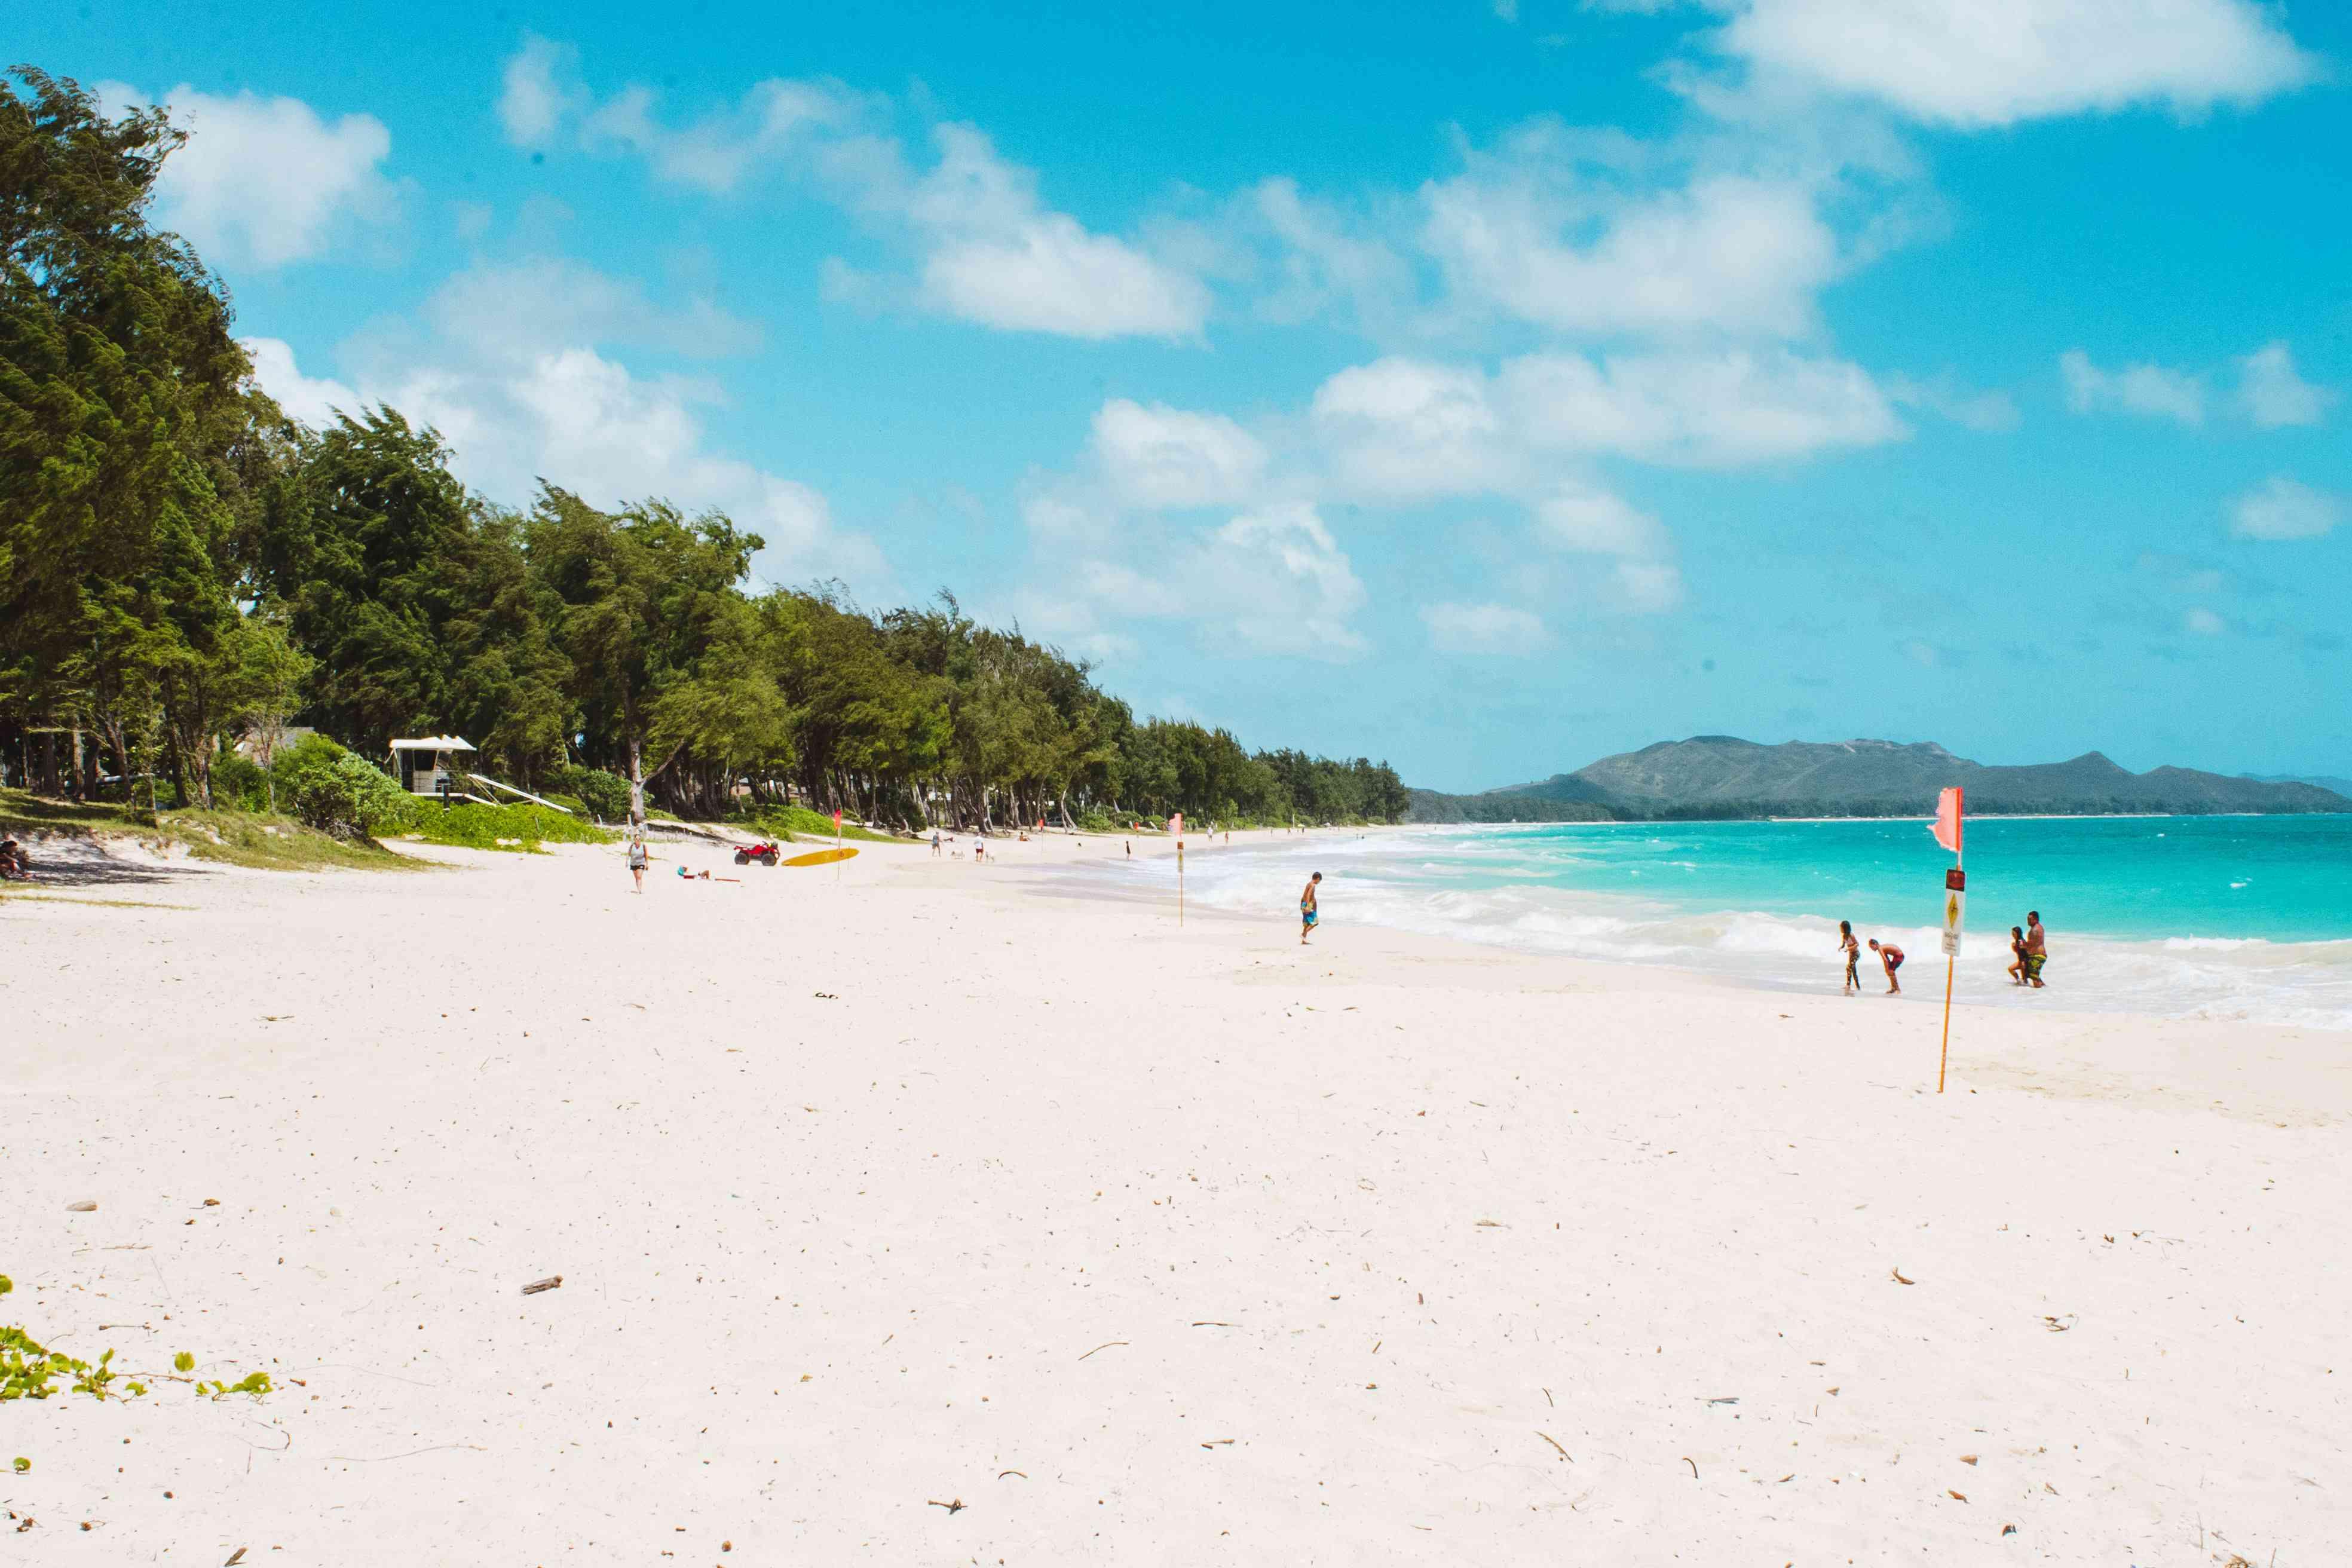 People playing on the beach at Waimanalo Beach